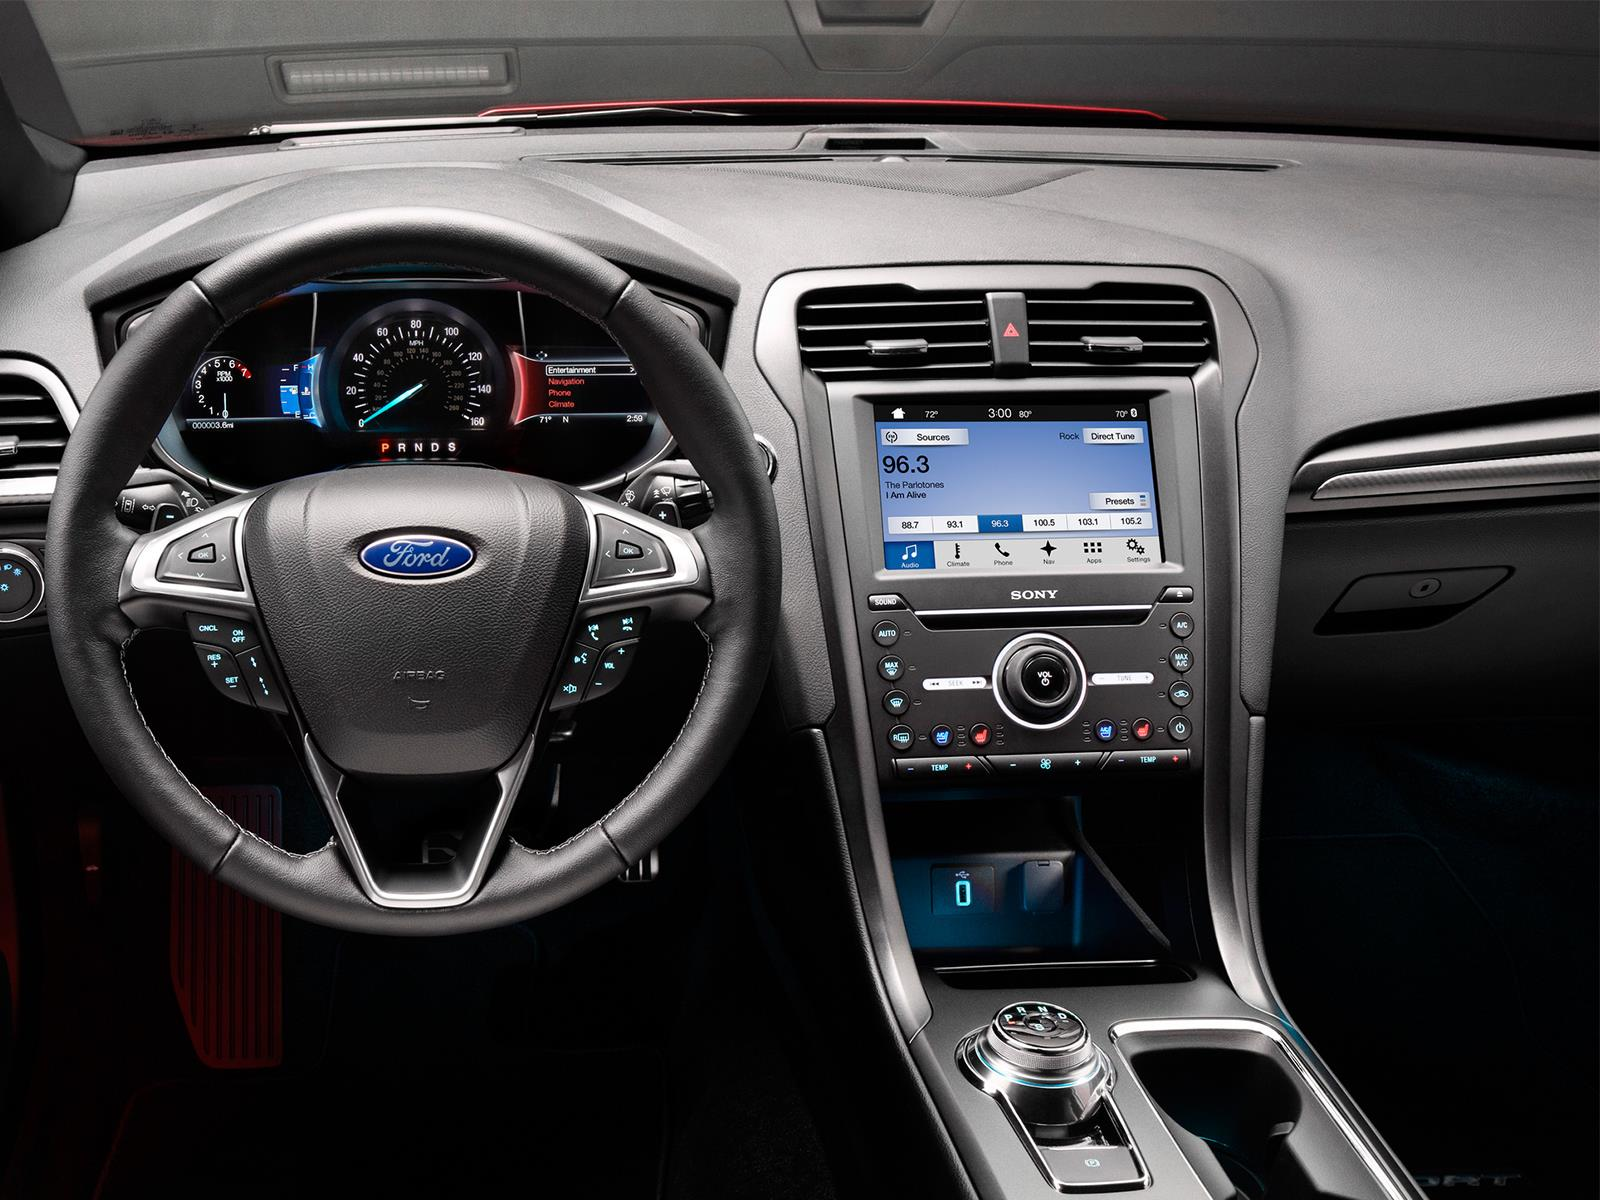 Ford Fusion 2017 Llega A M 233 Xico Desde 353 900 Pesos